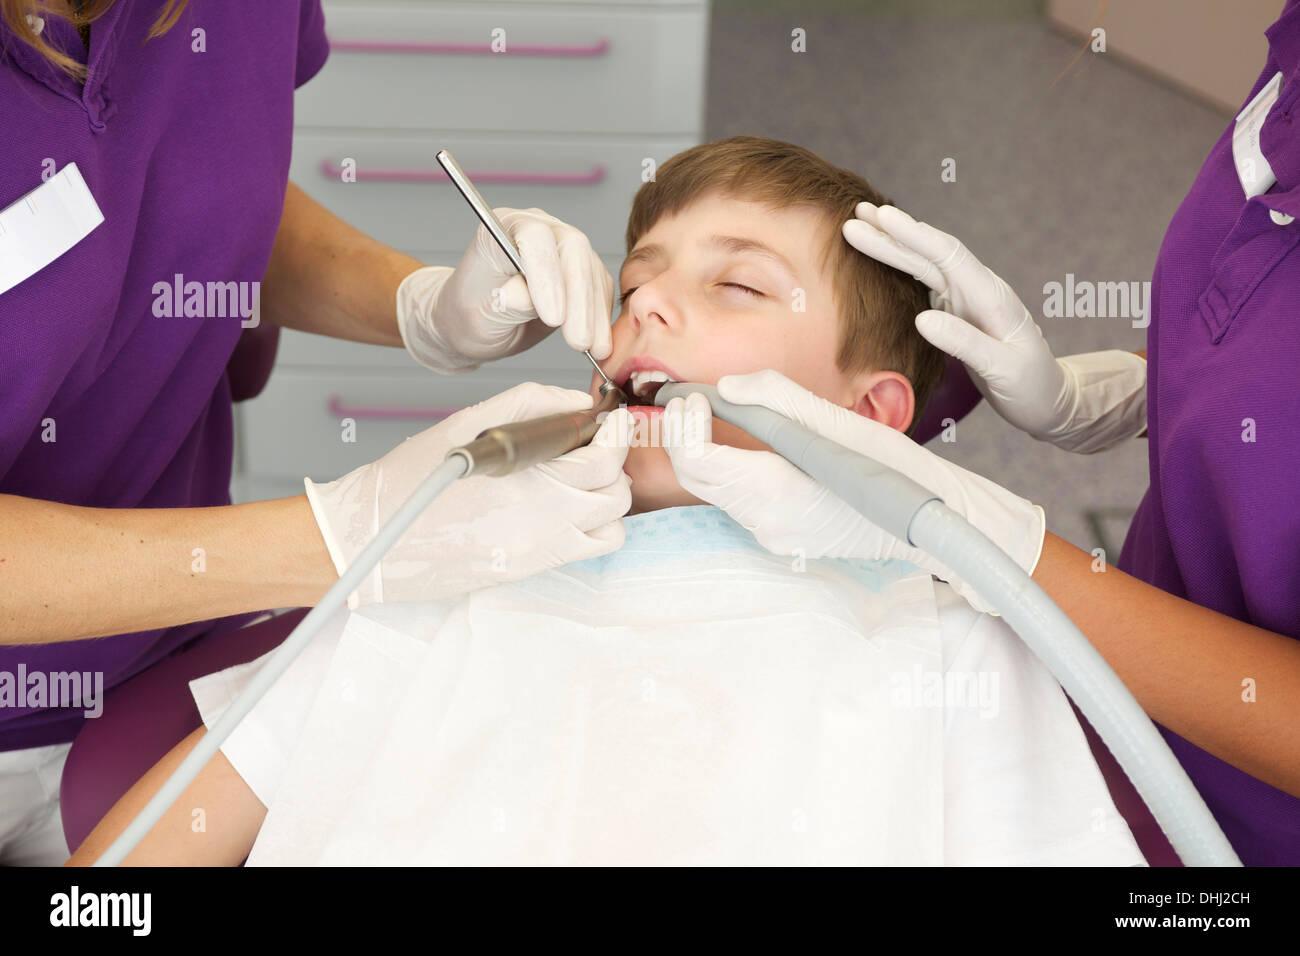 Besoin de soins dentaires patient garçon Photo Stock